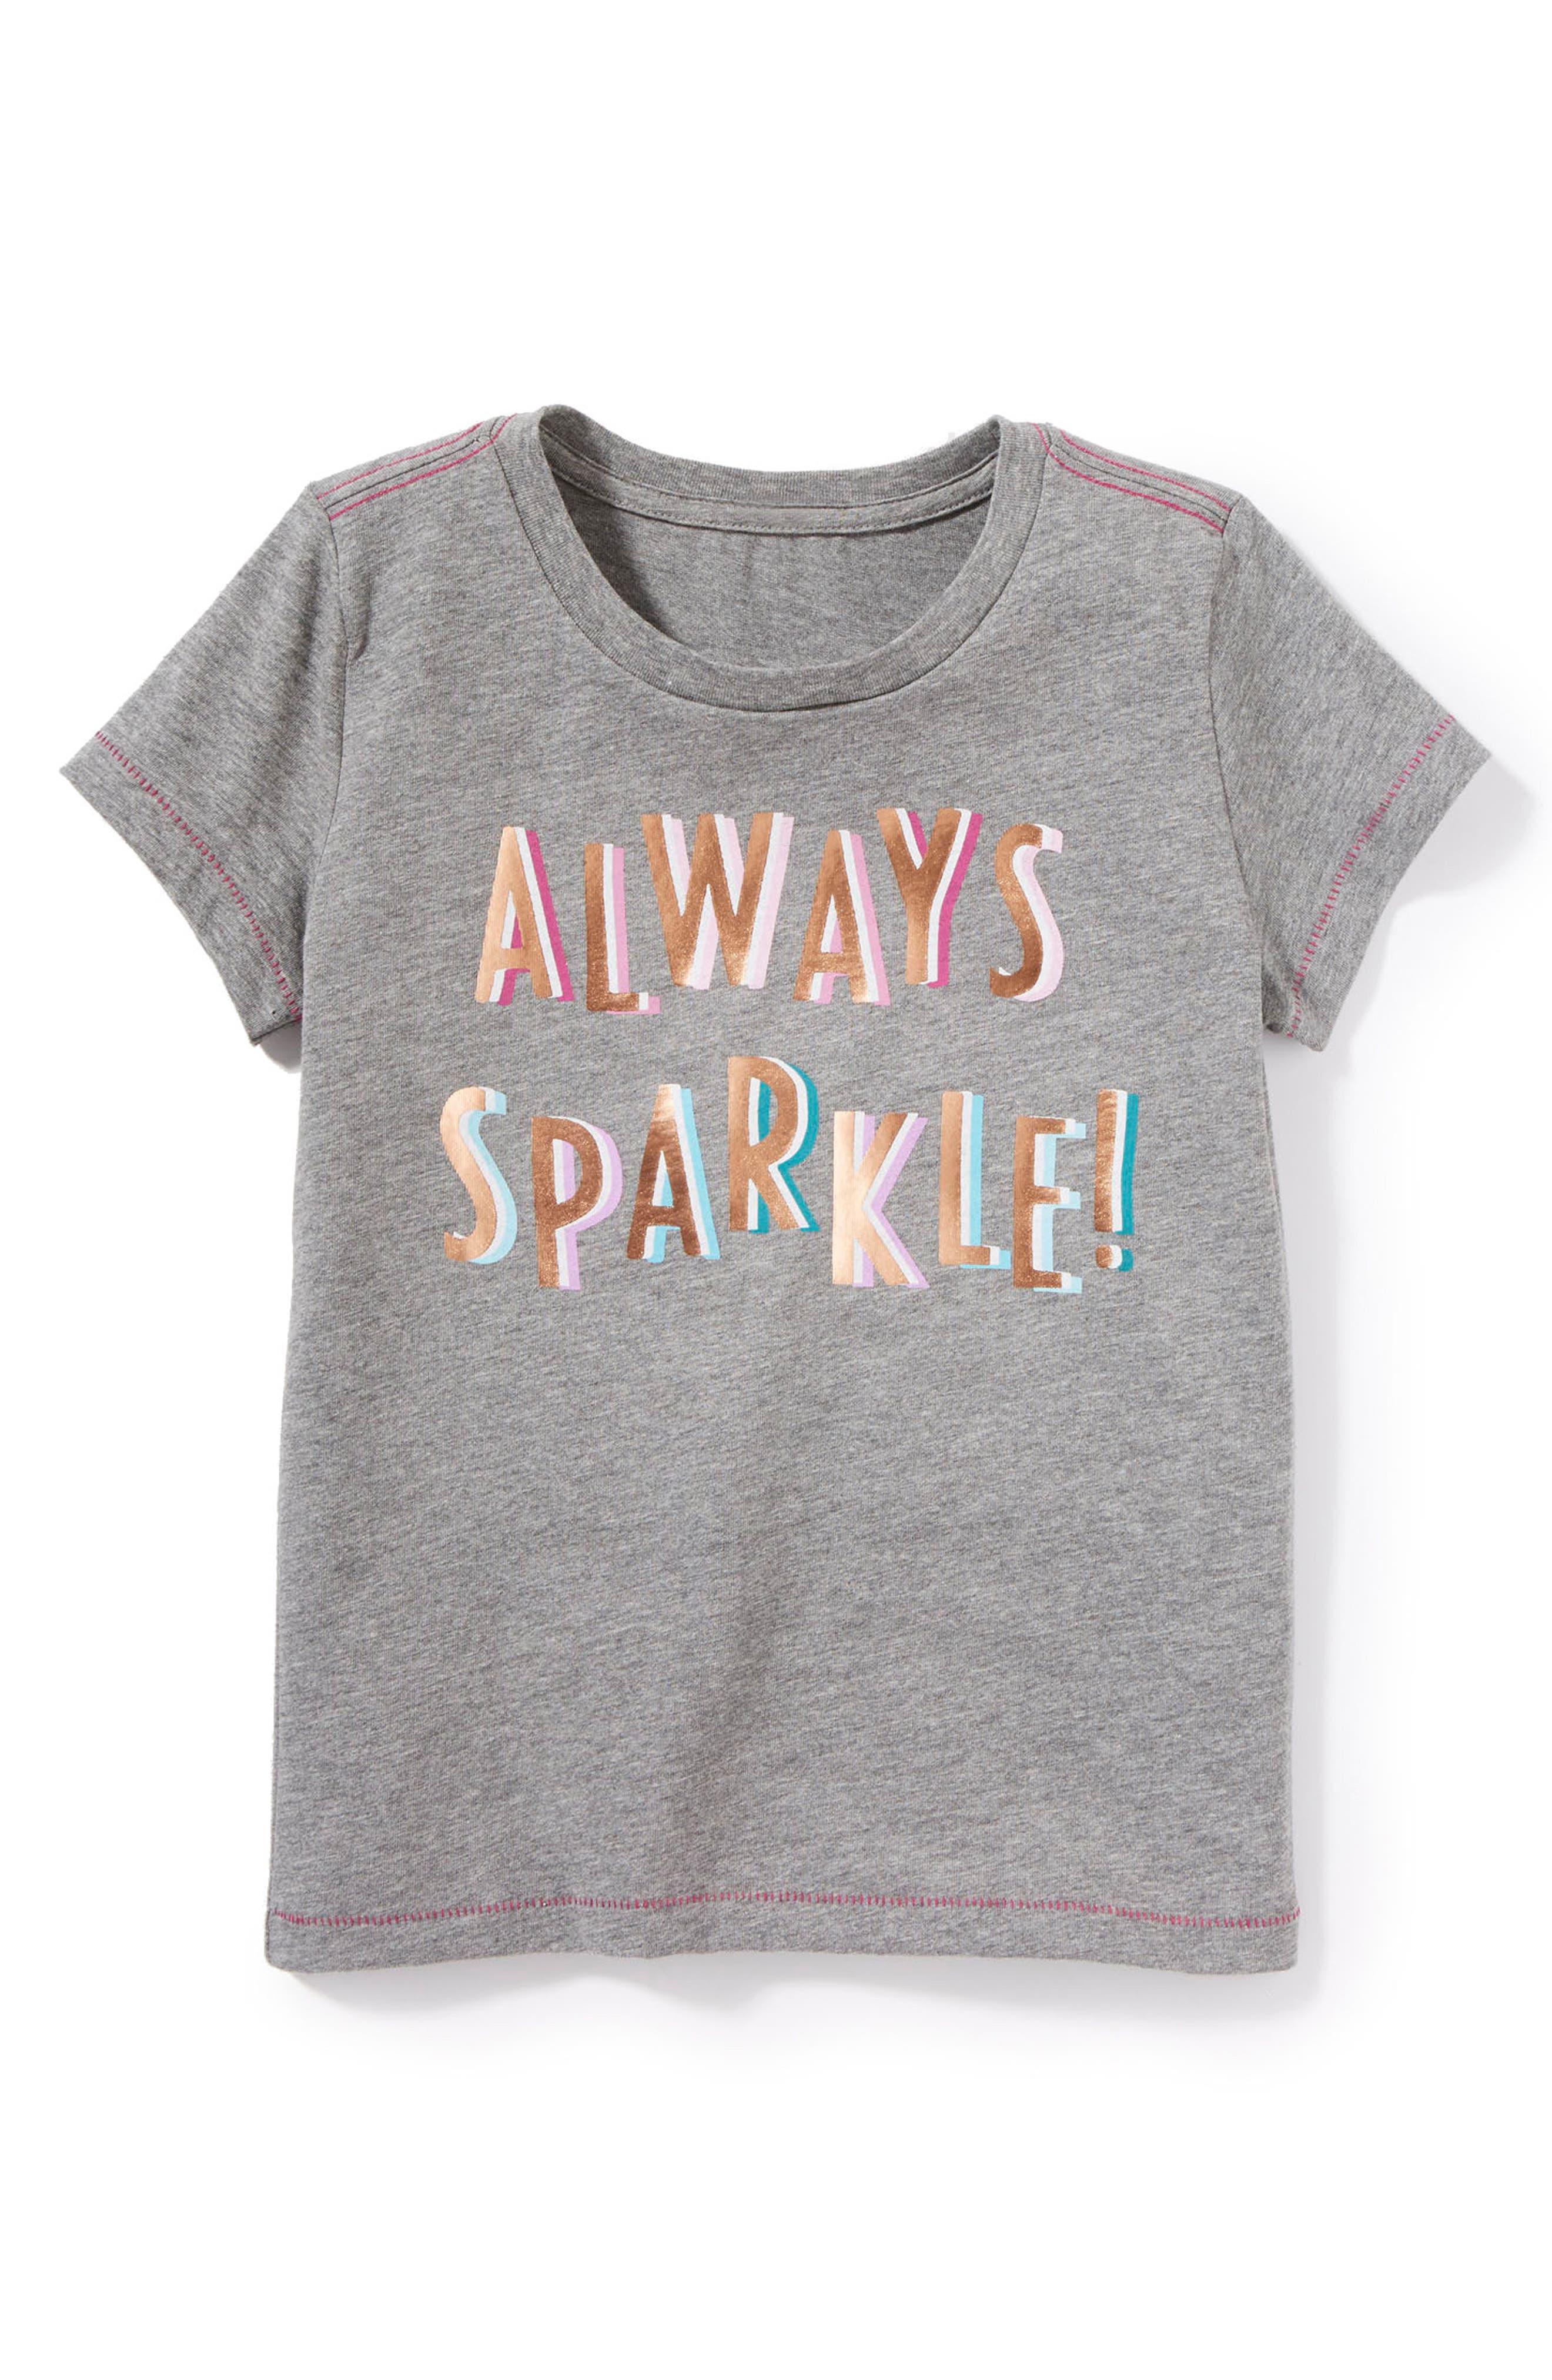 Main Image - Peek Always Sparkle Graphic Tee (Toddler Girls, Little Girls & Big Girls)